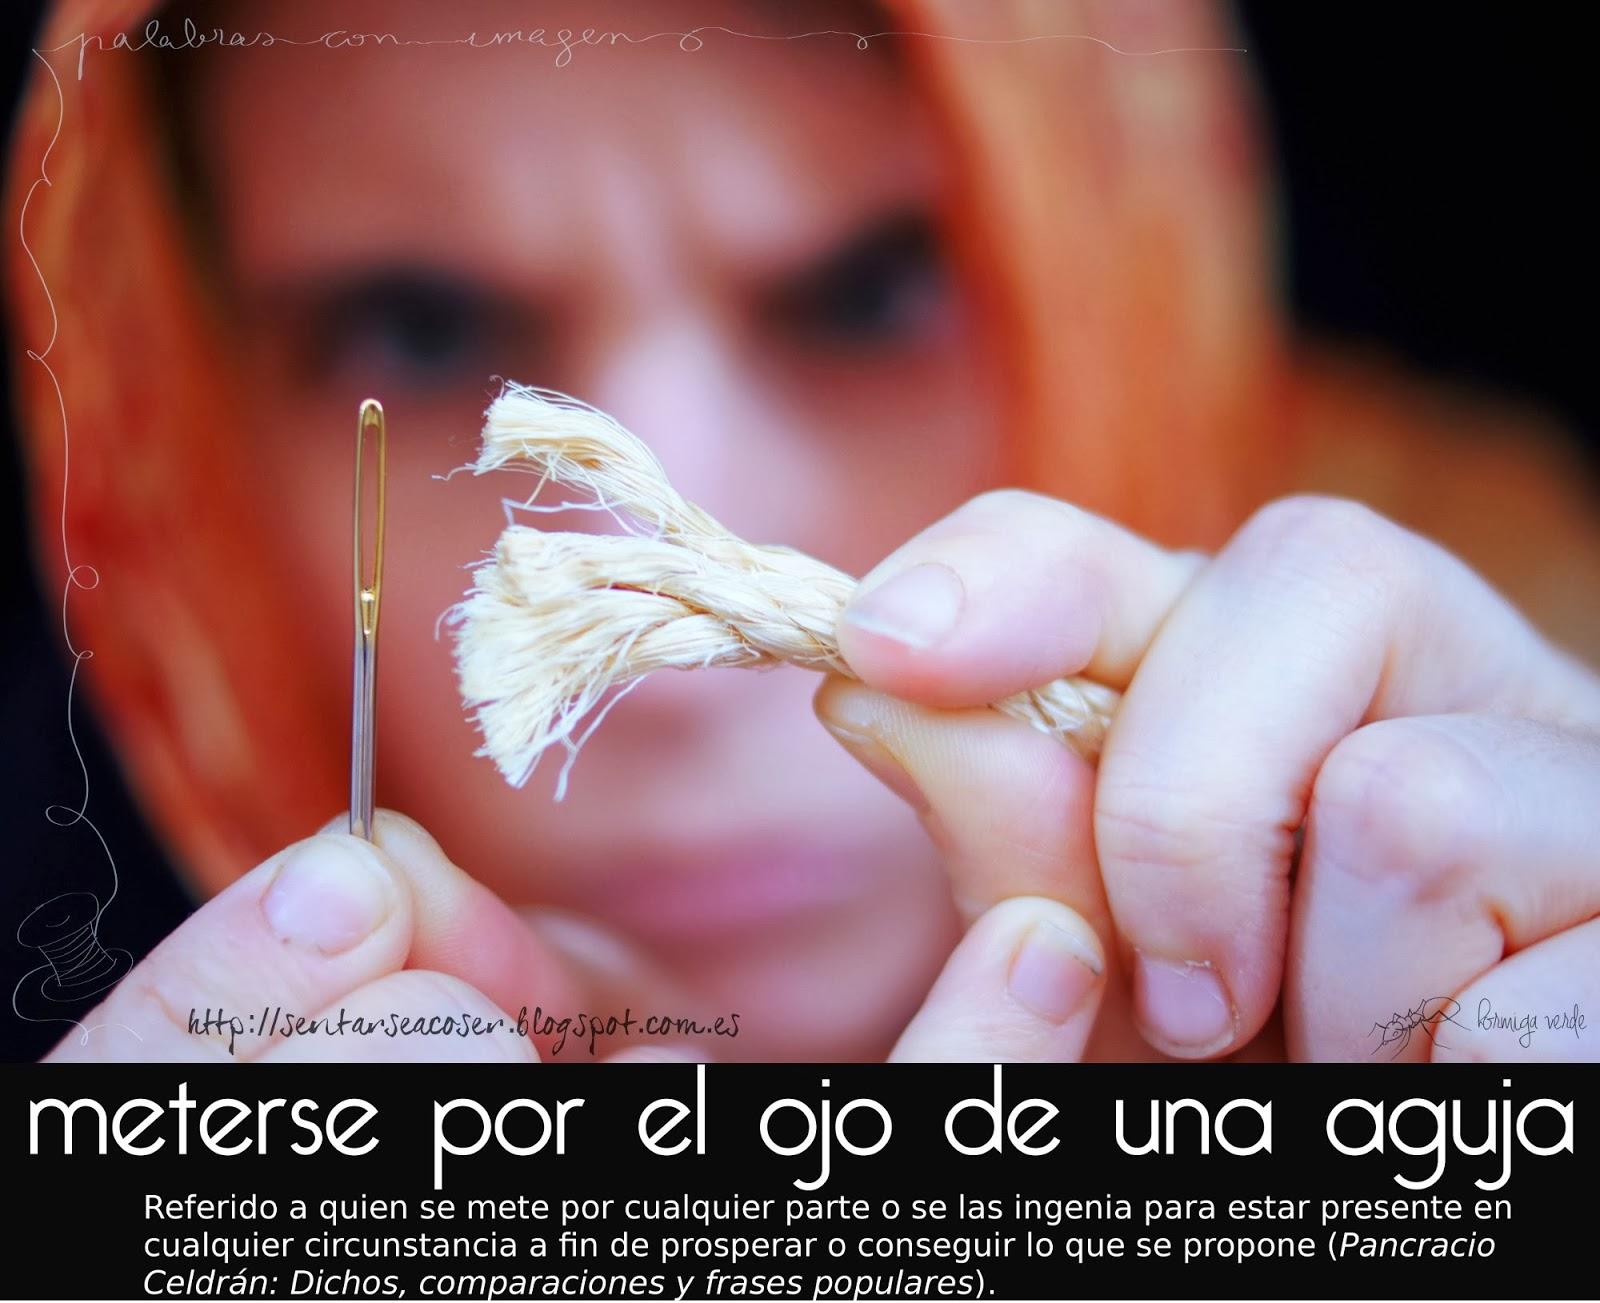 http://sentarseacoser.blogspot.com.es/2013/11/palabras-con-imagen-metersepasar-por-el.html